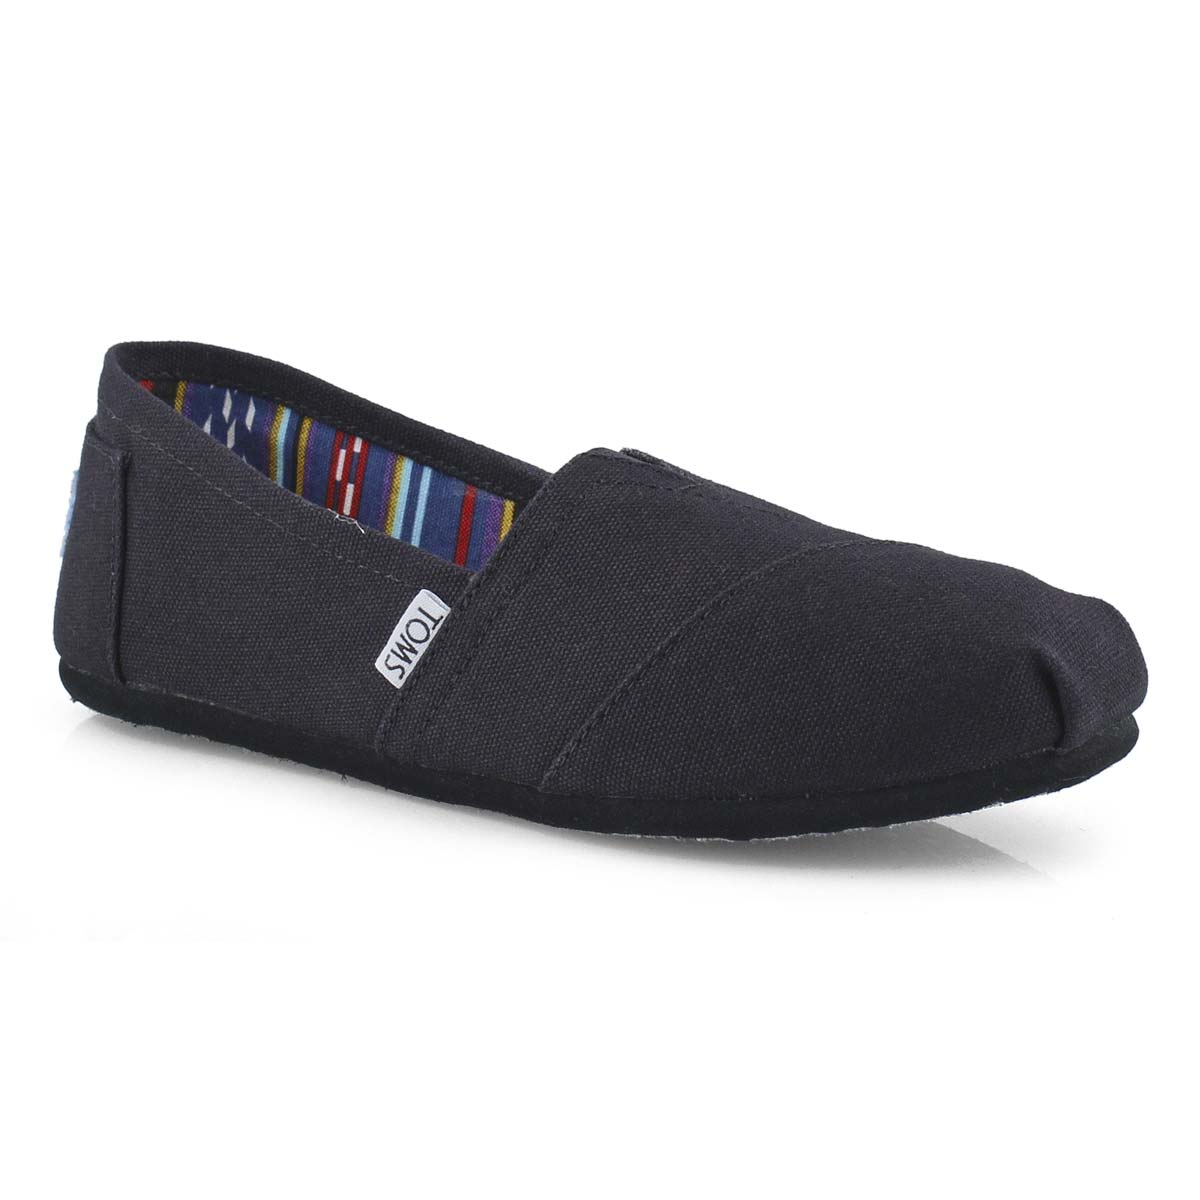 Women's Classic Canvas Loafer - Black Black